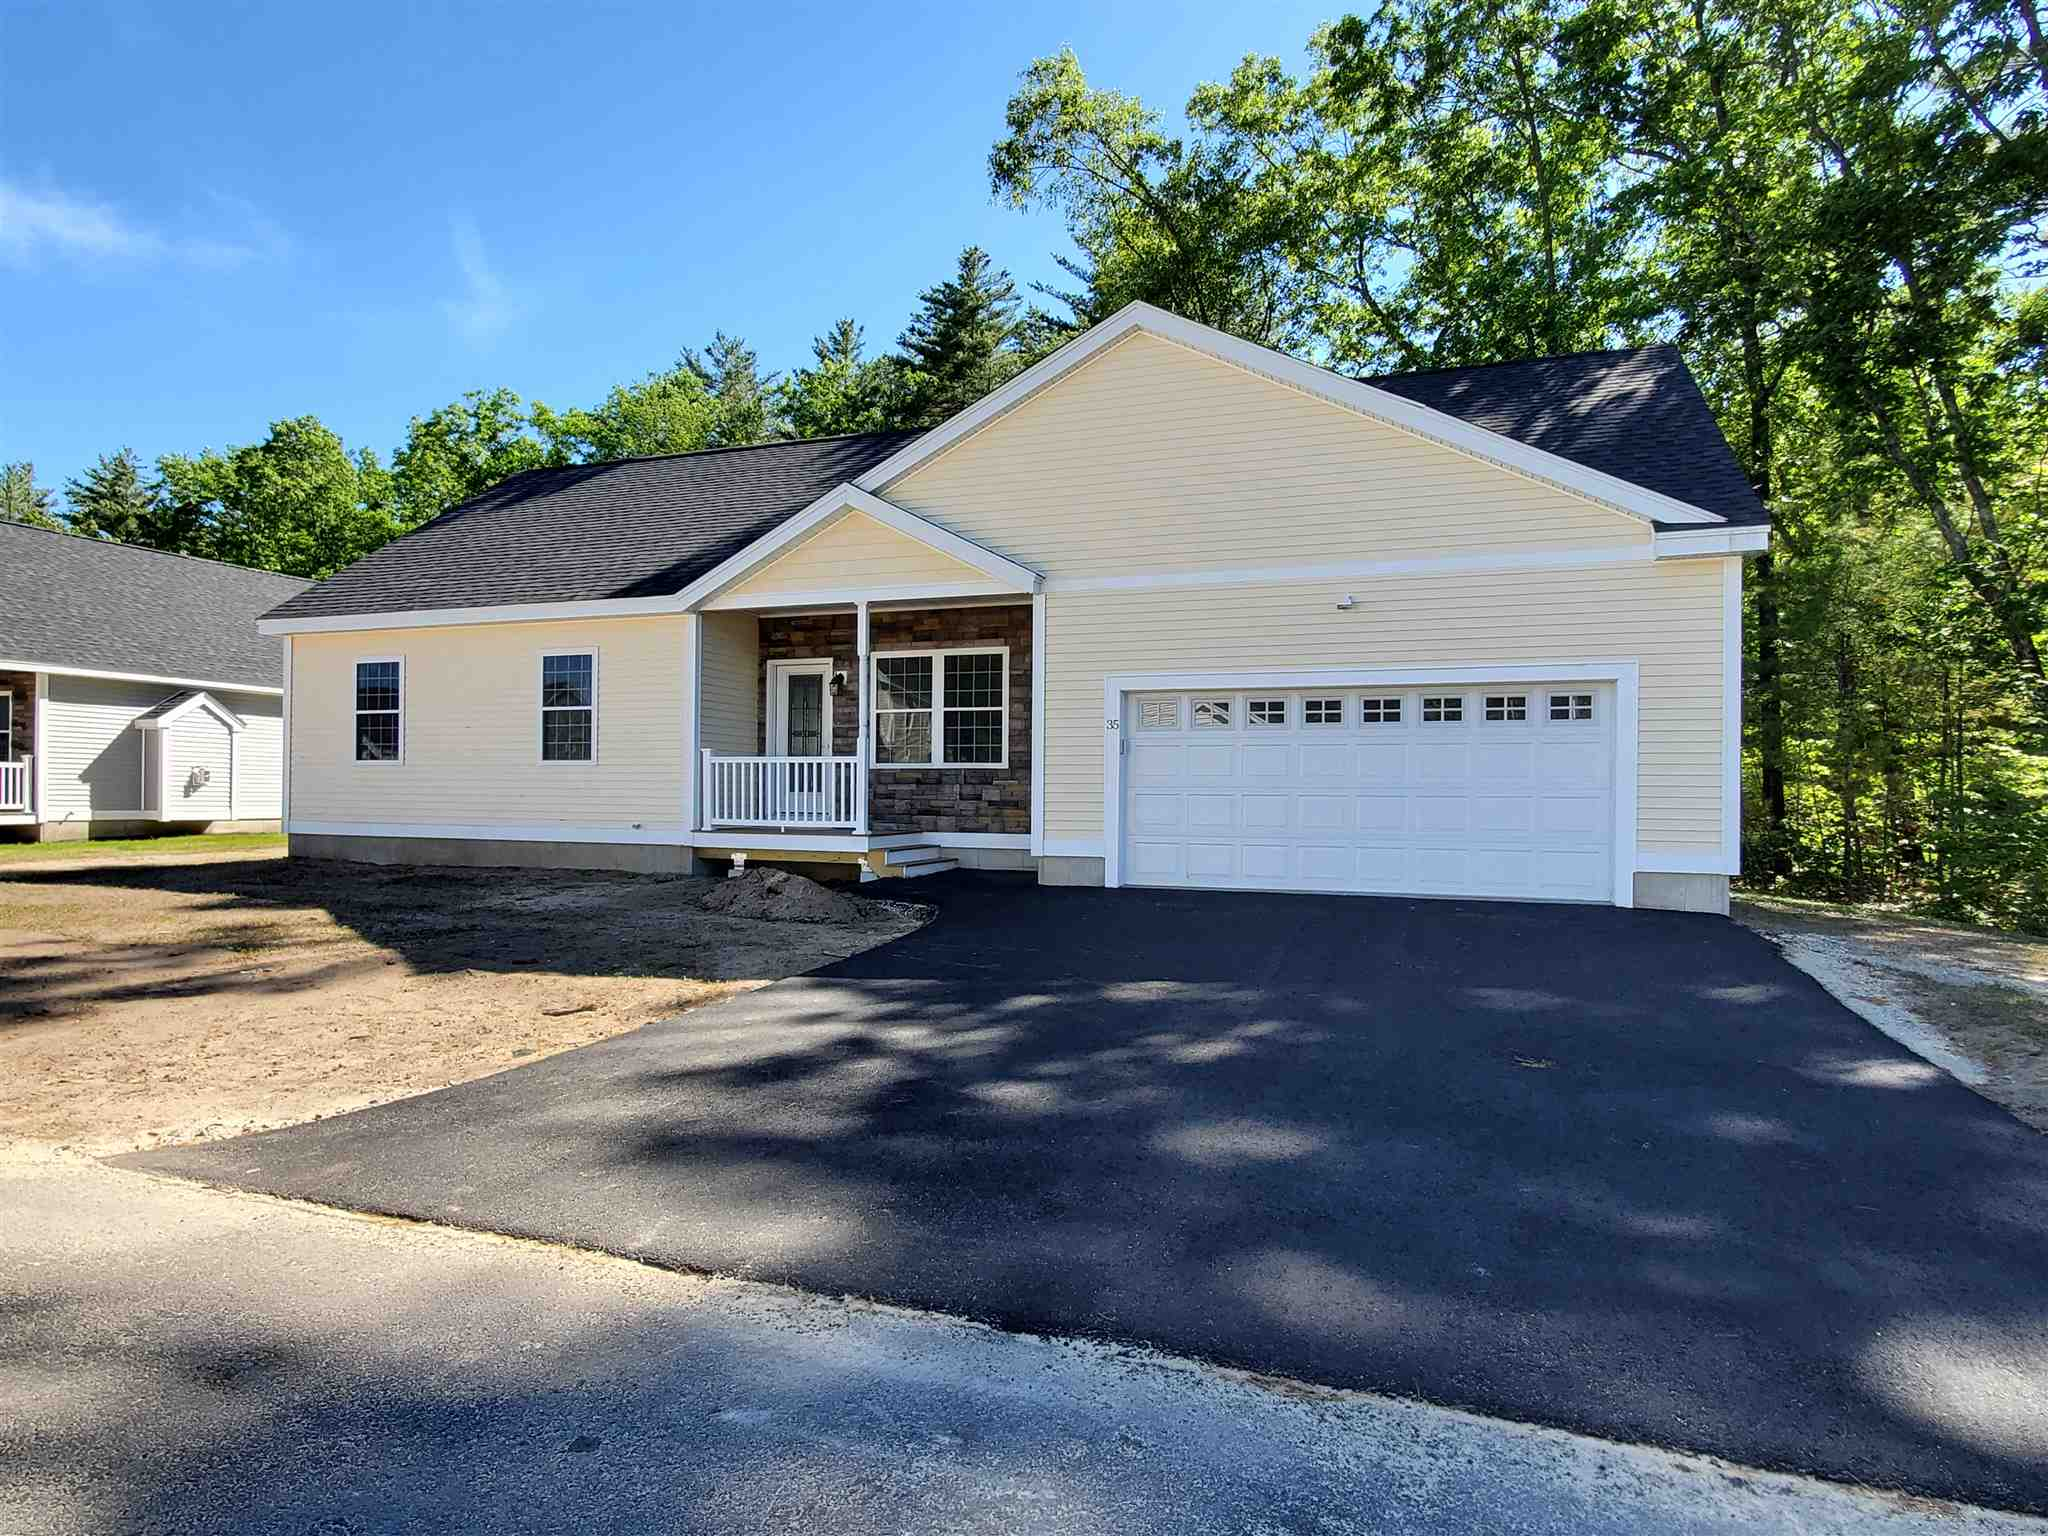 Photo of 35 Richmond Drive Concord NH 03303